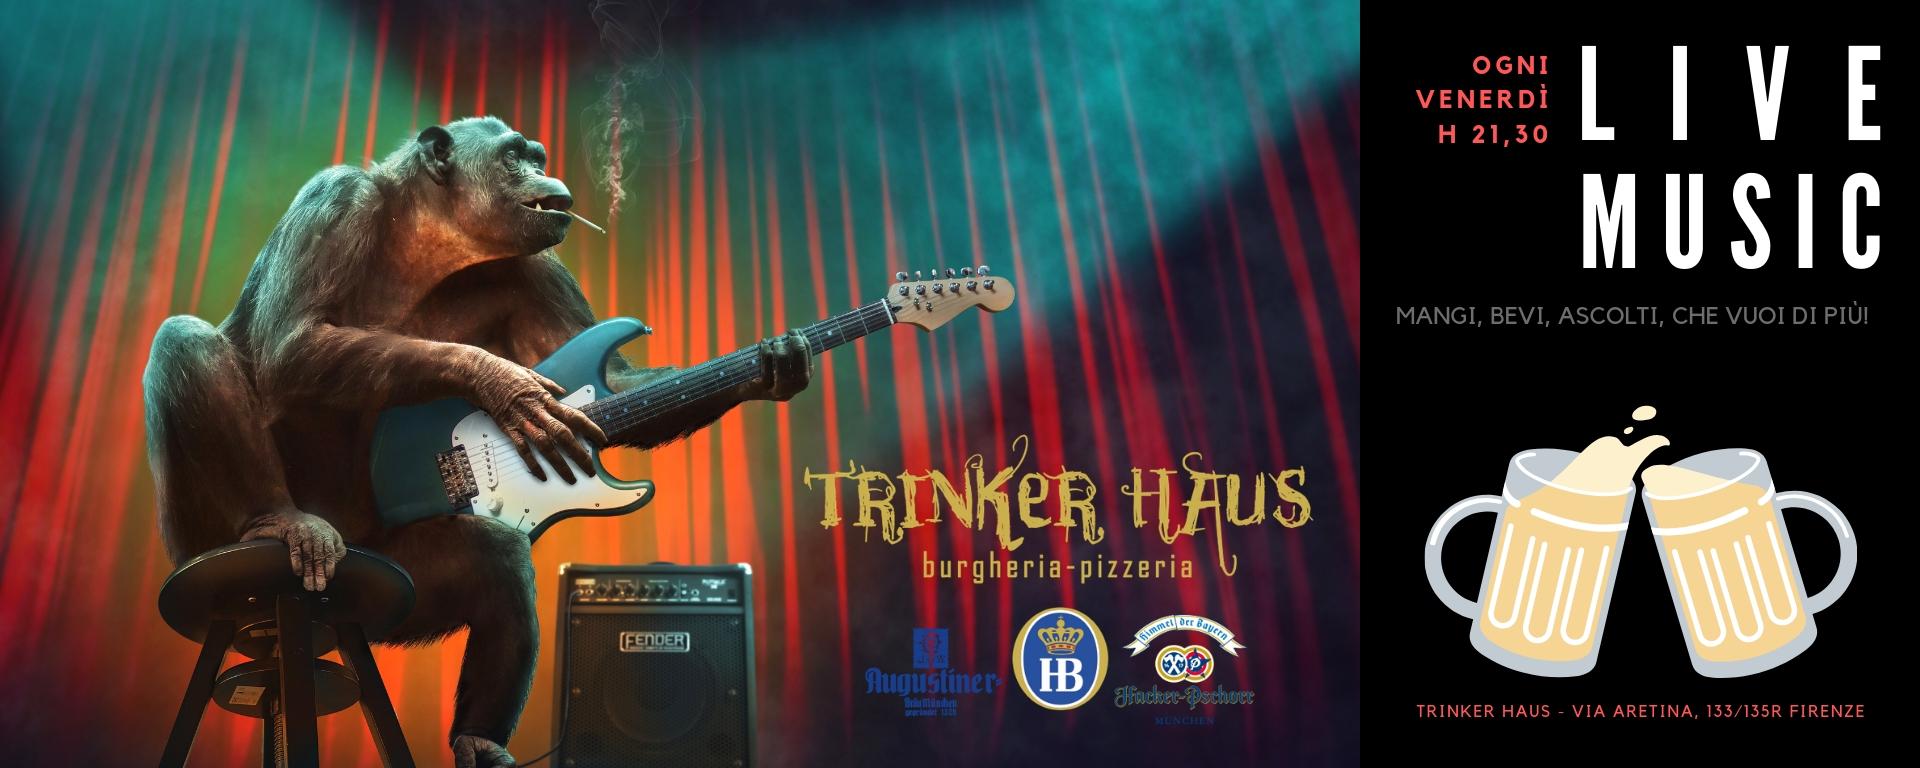 LiveMusic TrinkerHaus